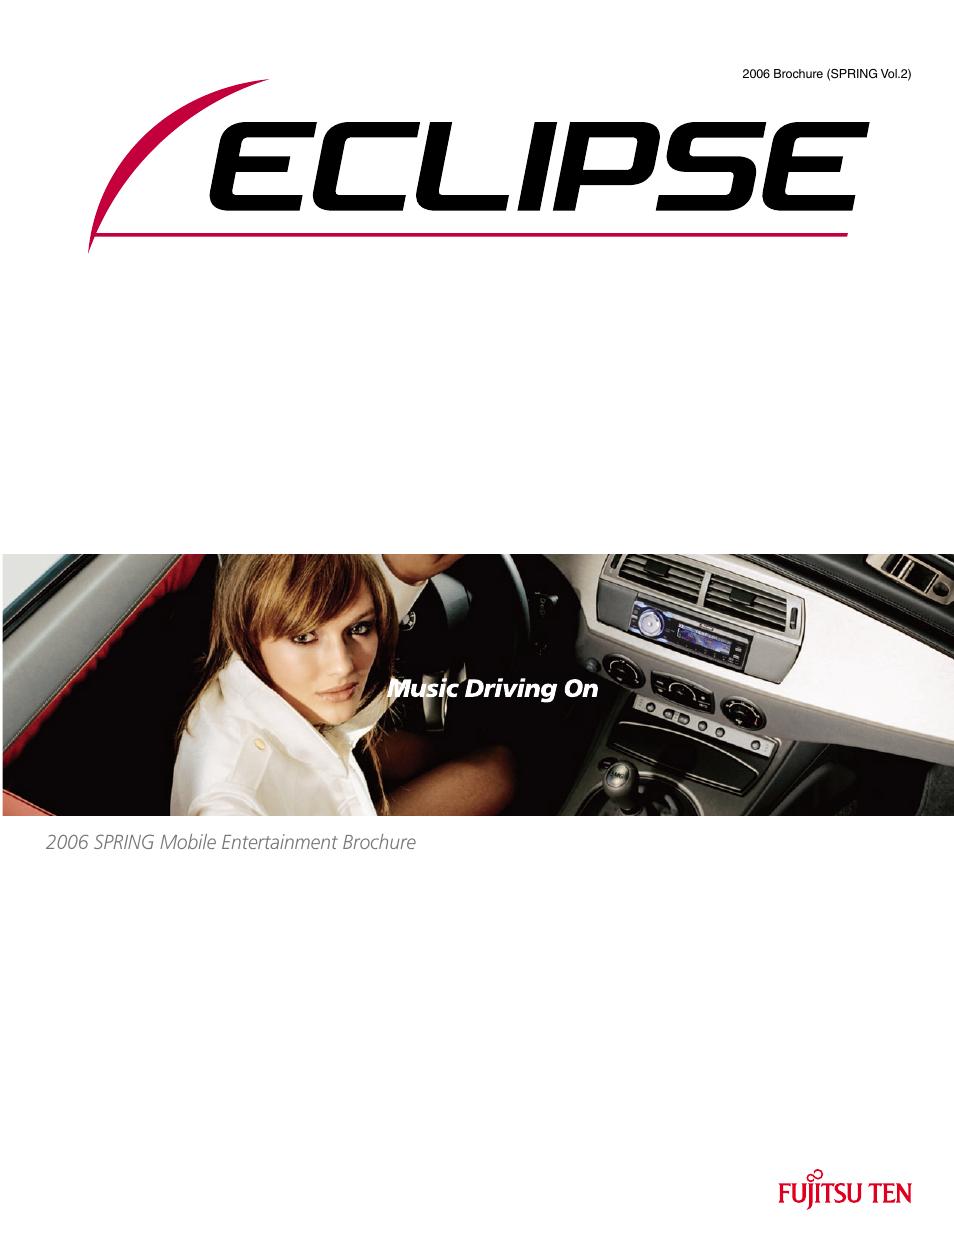 eclipse fujitsu ten eclipse avn7000 user manual 36 pages also rh manualsdir com Eclipse Map Disc Eclipse Double Din Deck